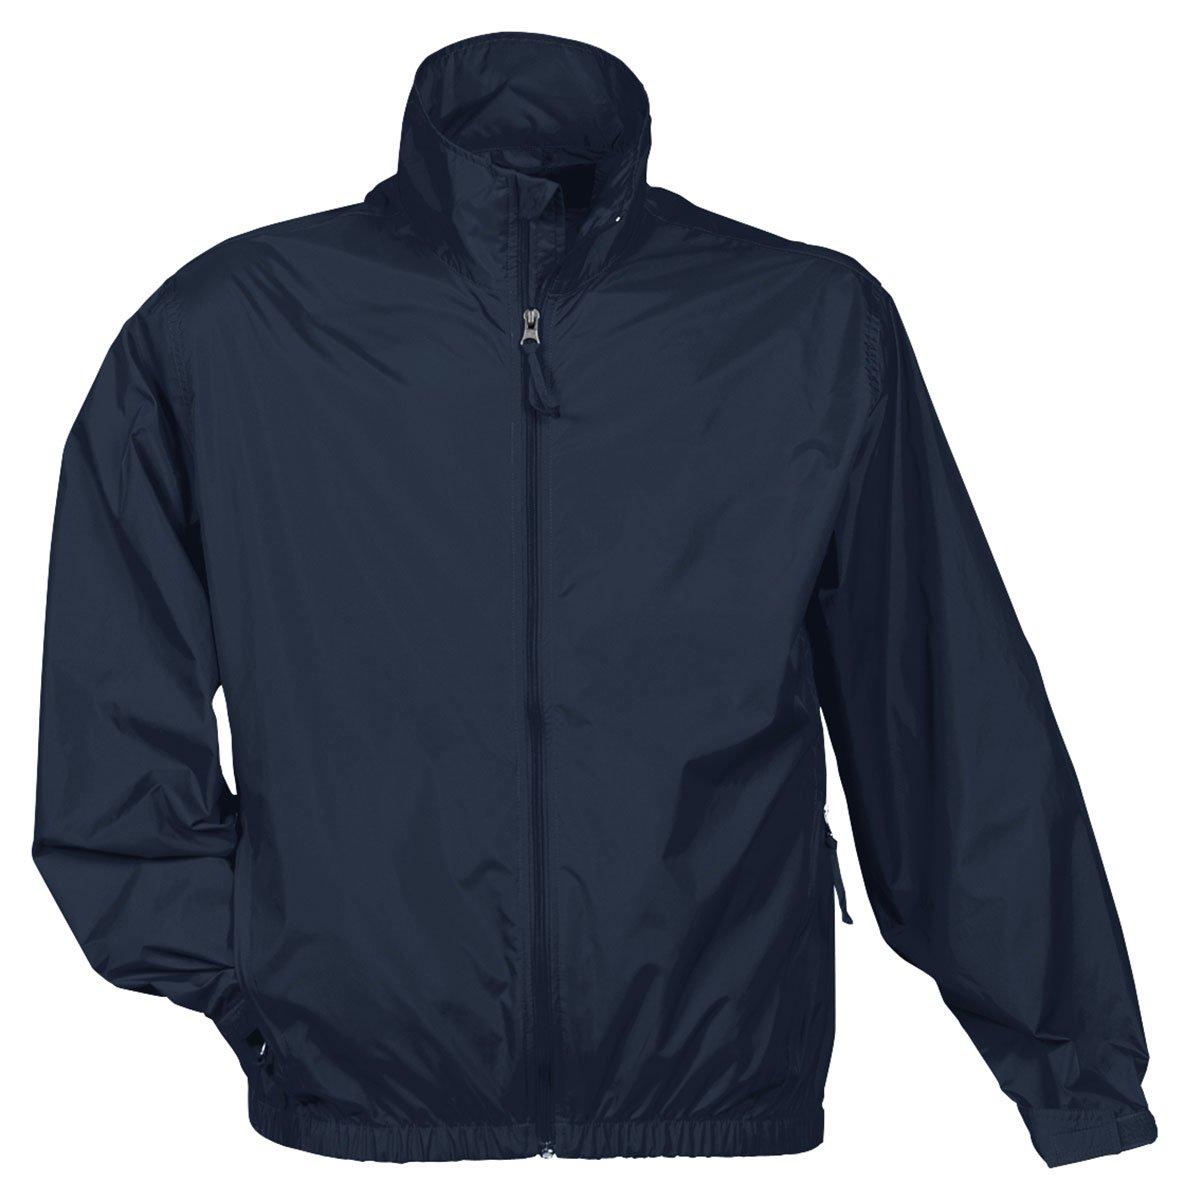 Tri-Mountain Men's Lightweight Water Resistant Jacket by Tri-Mountain